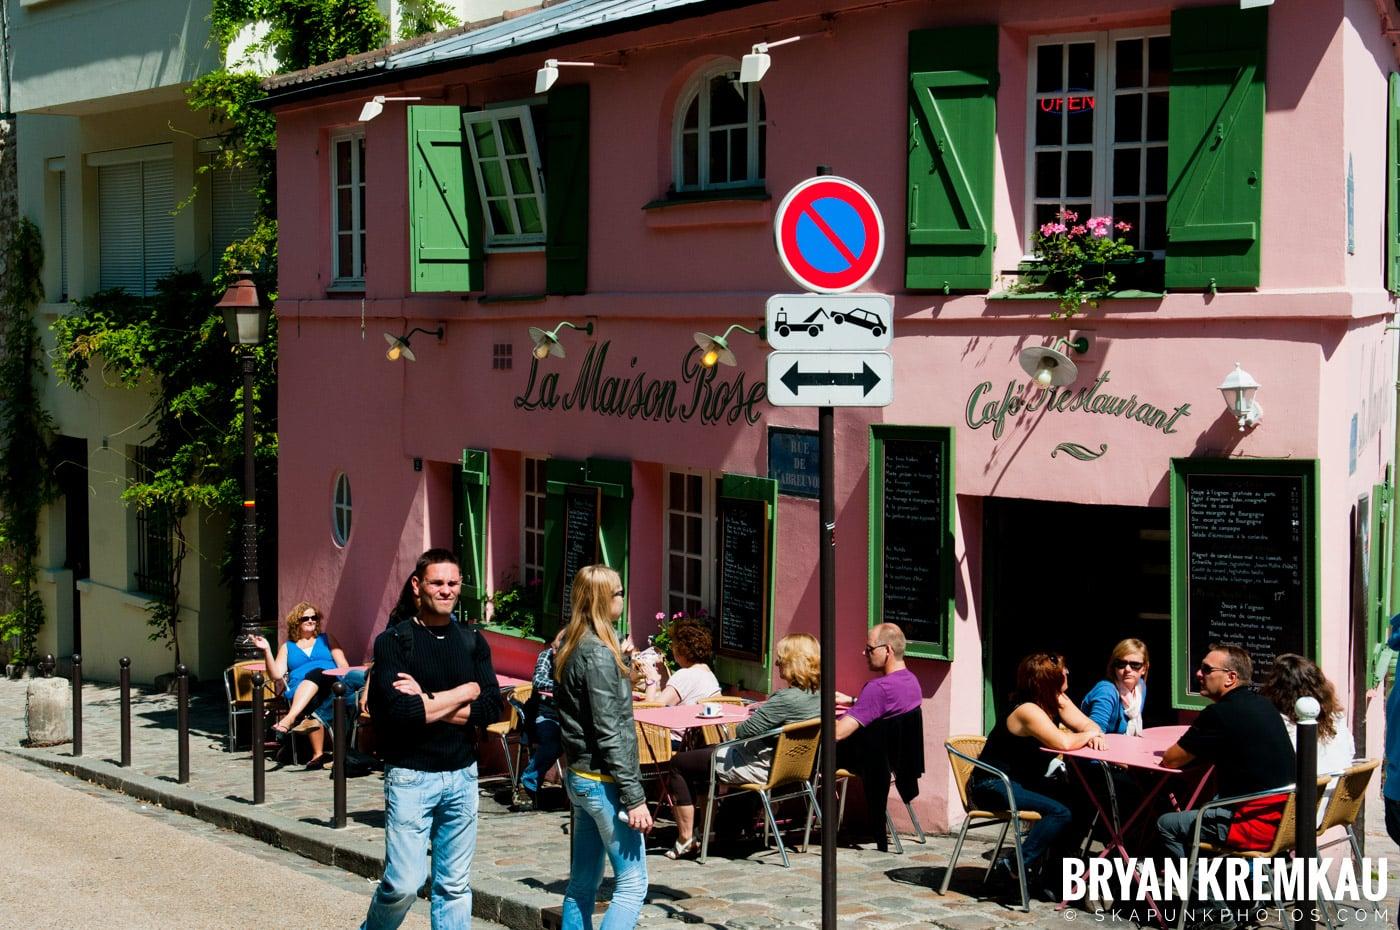 Paris, France Honeymoon - Day 6 - 7.23.11 (30)